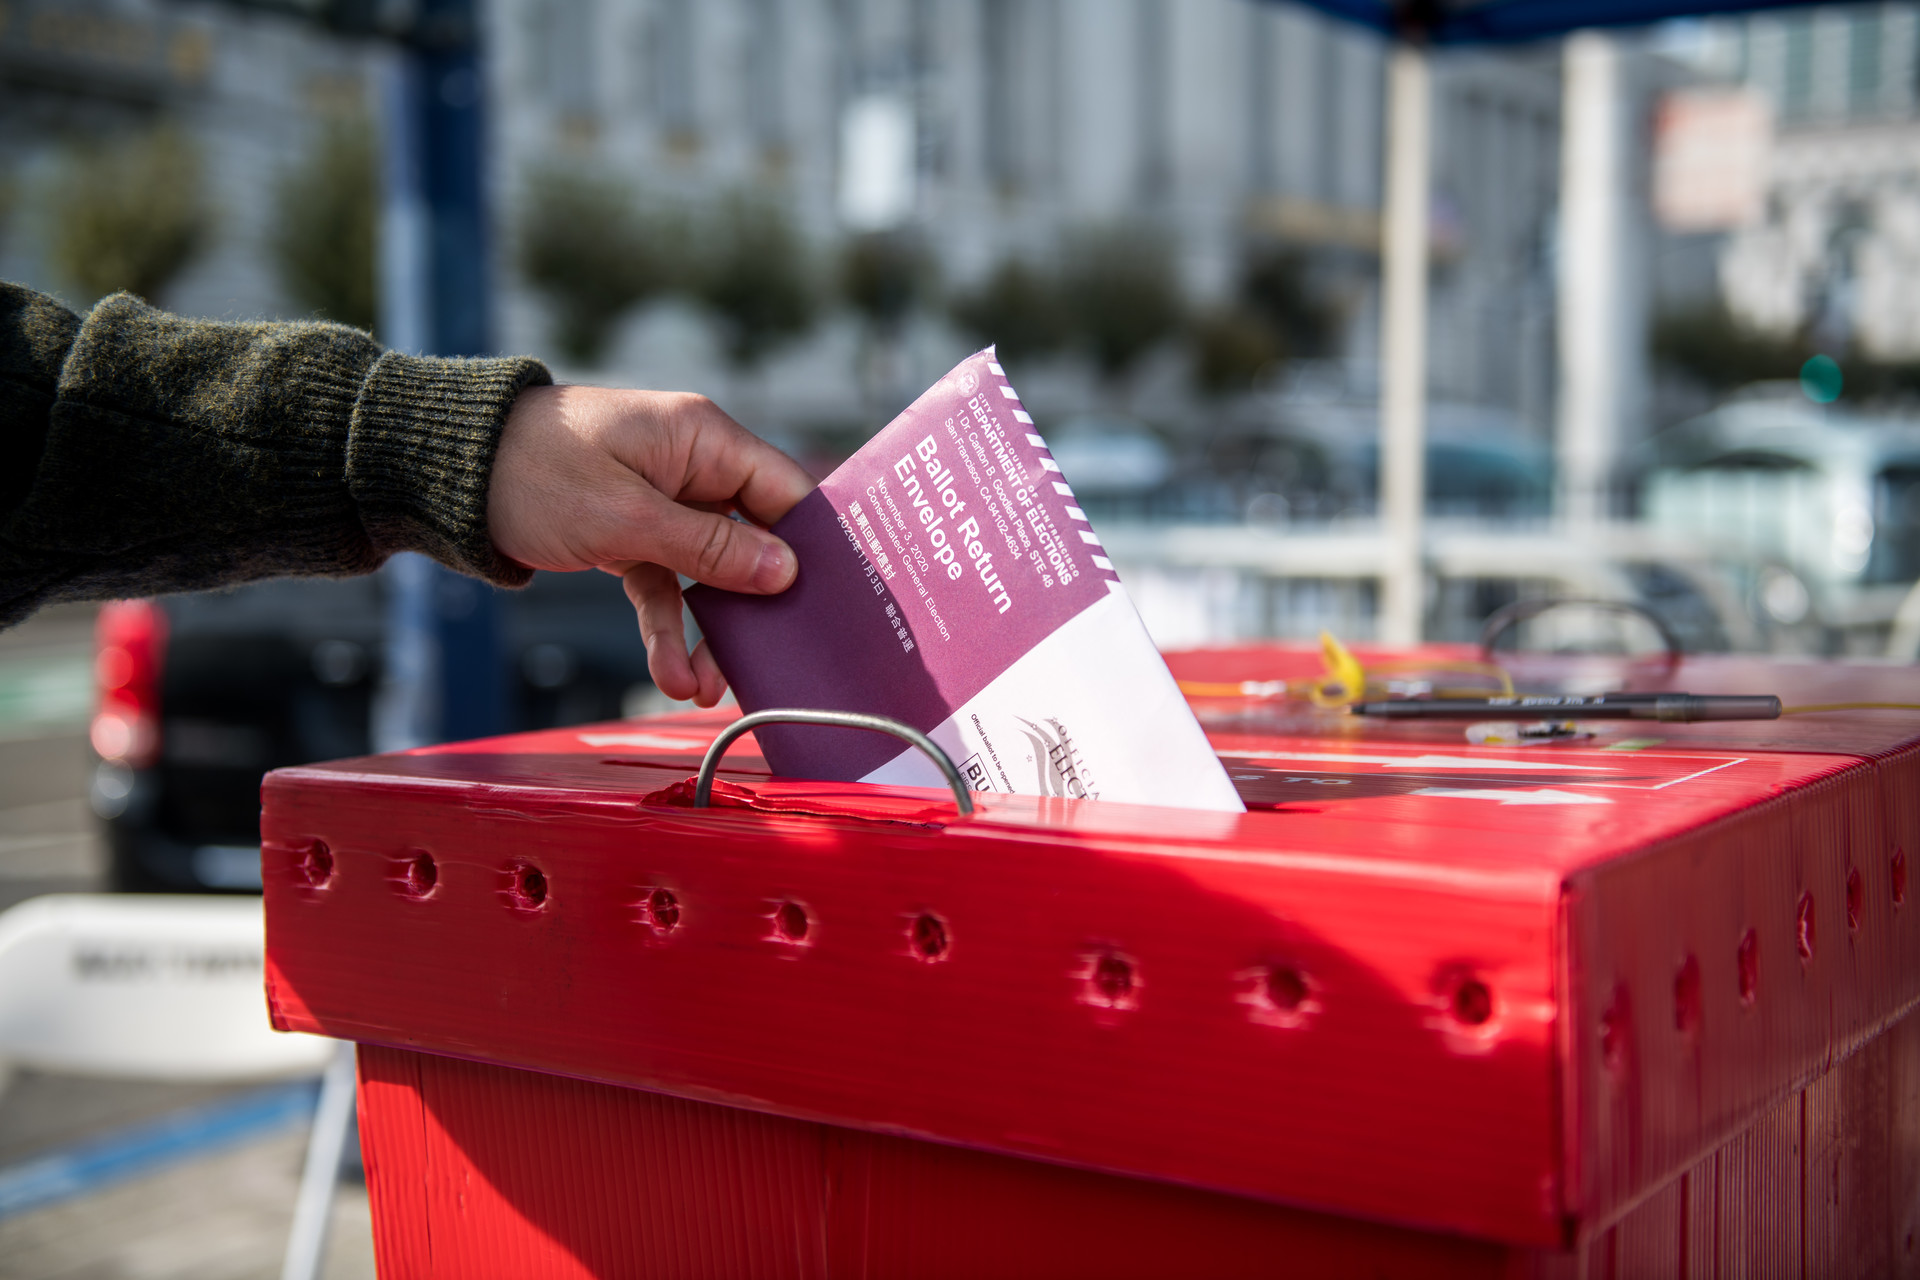 Hand holding ballot drops it in red cardboard ballot box